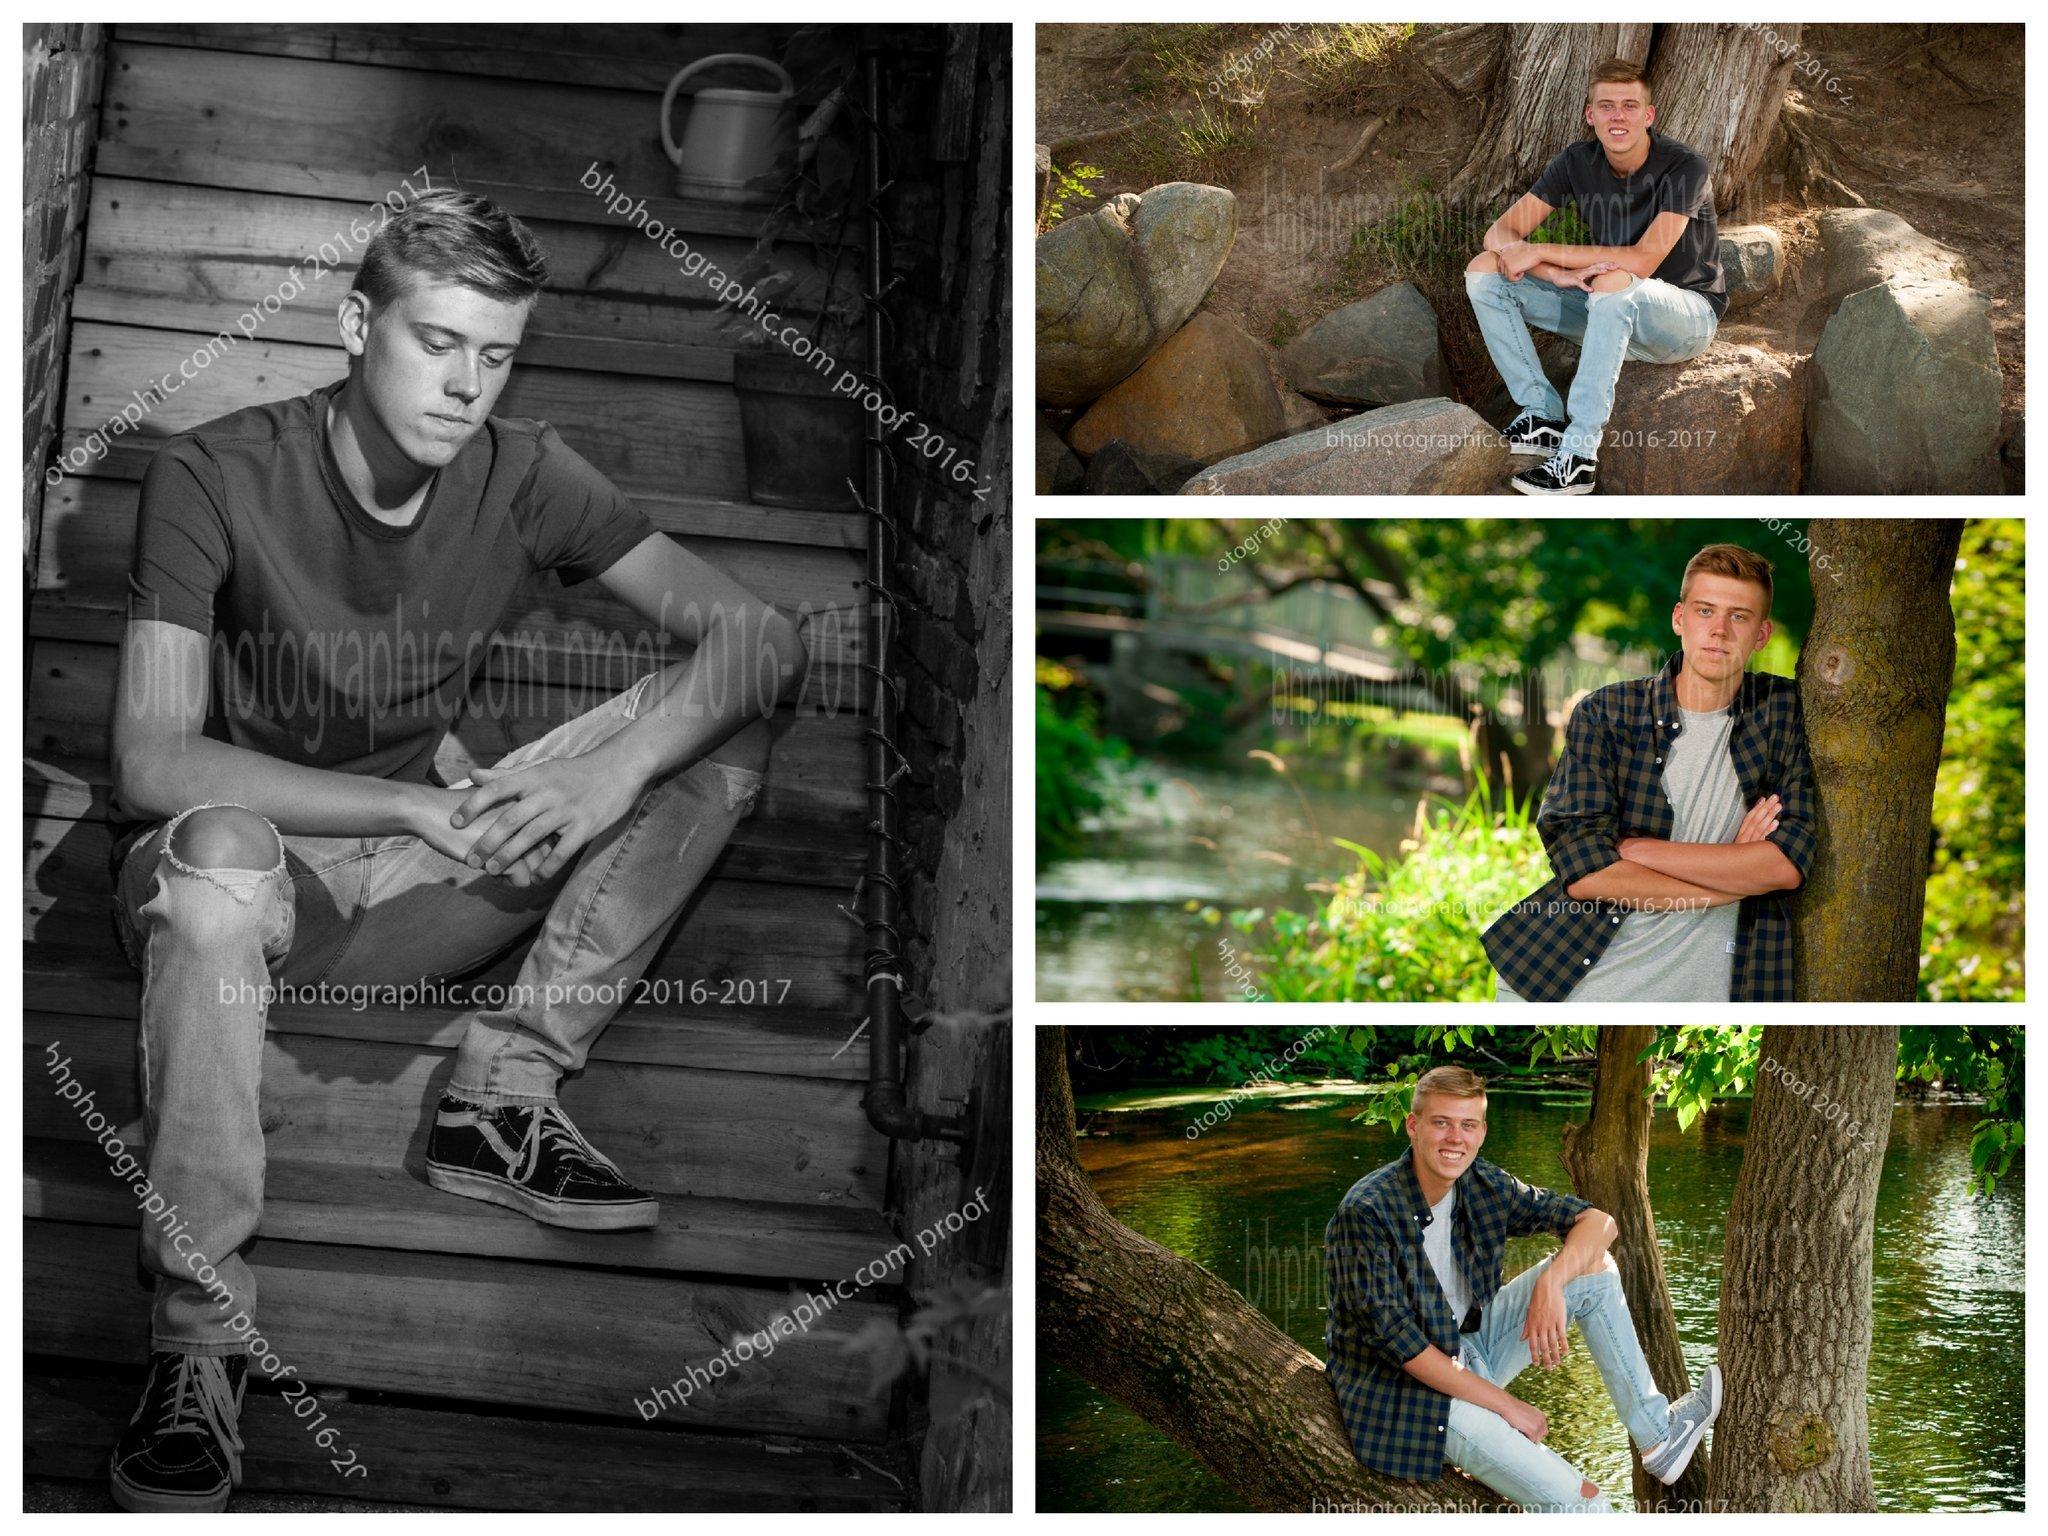 Collage_Fotor 4 up.jpg